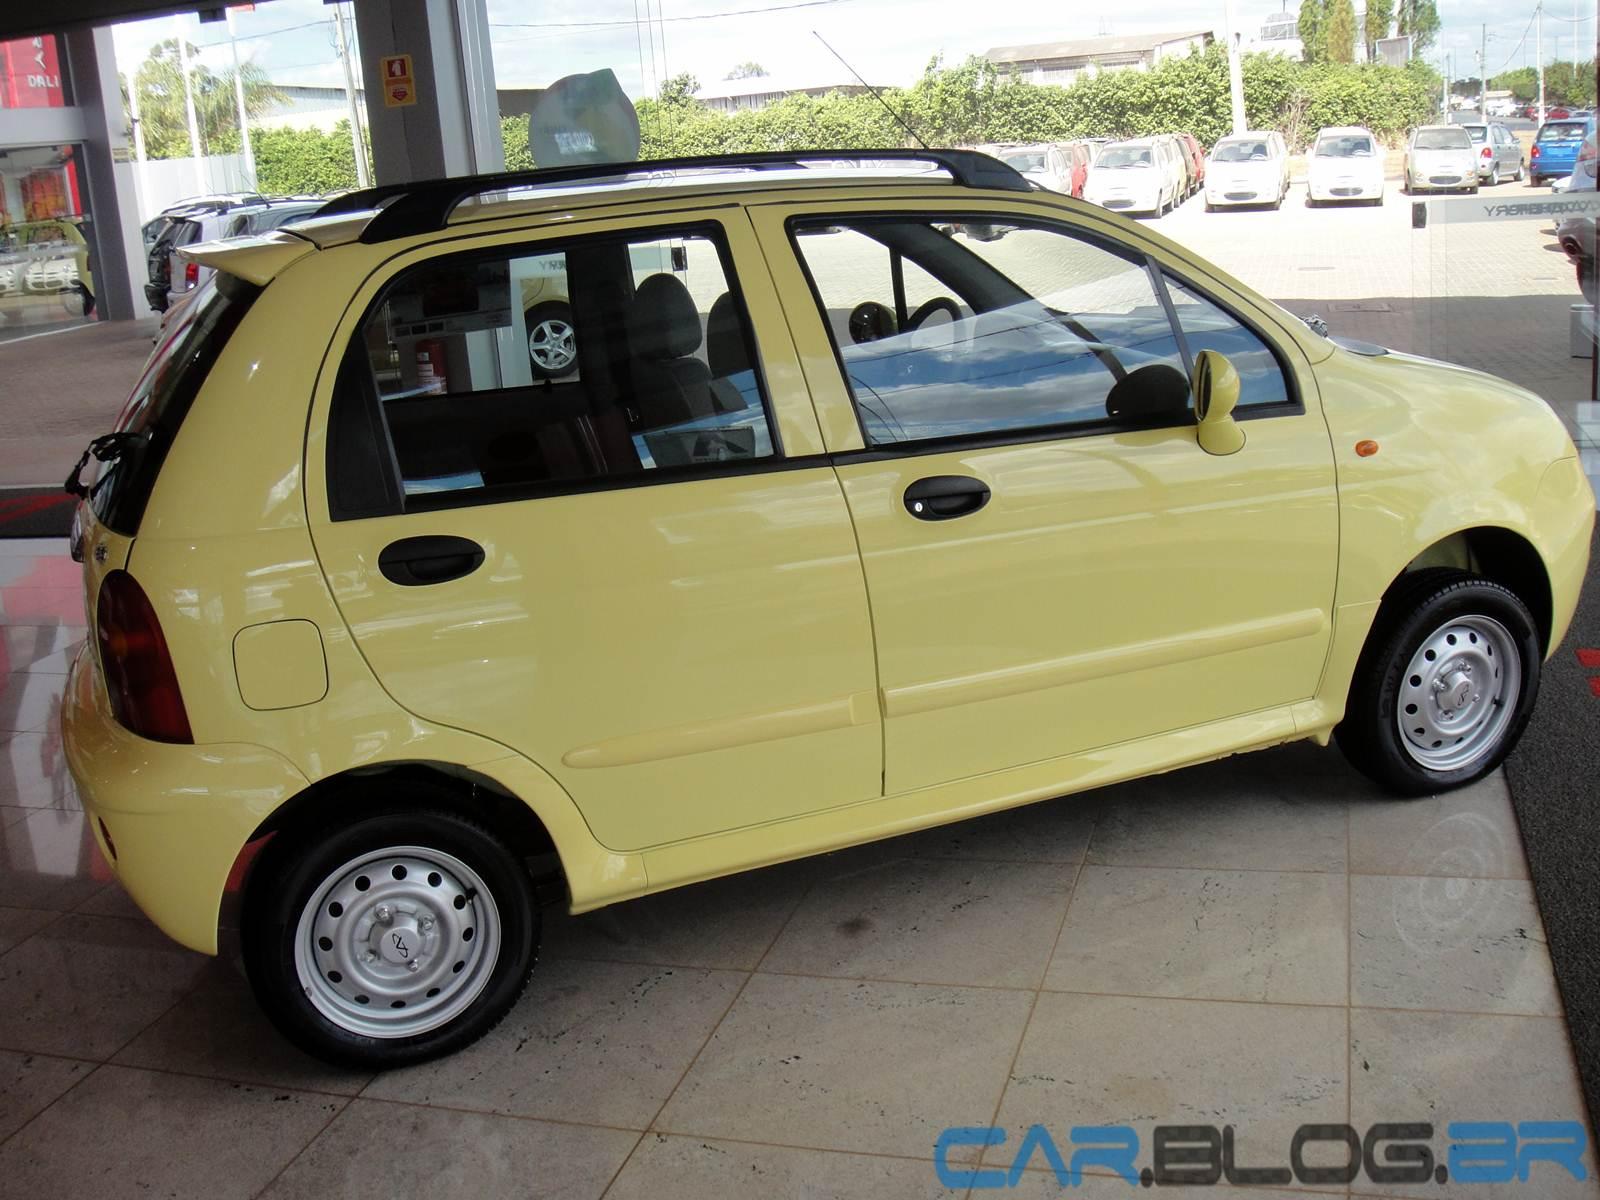 88 carros usados baratos fotos de carros carros usados baratos 15 e comprar carro barato - Carro herramientas barato ...